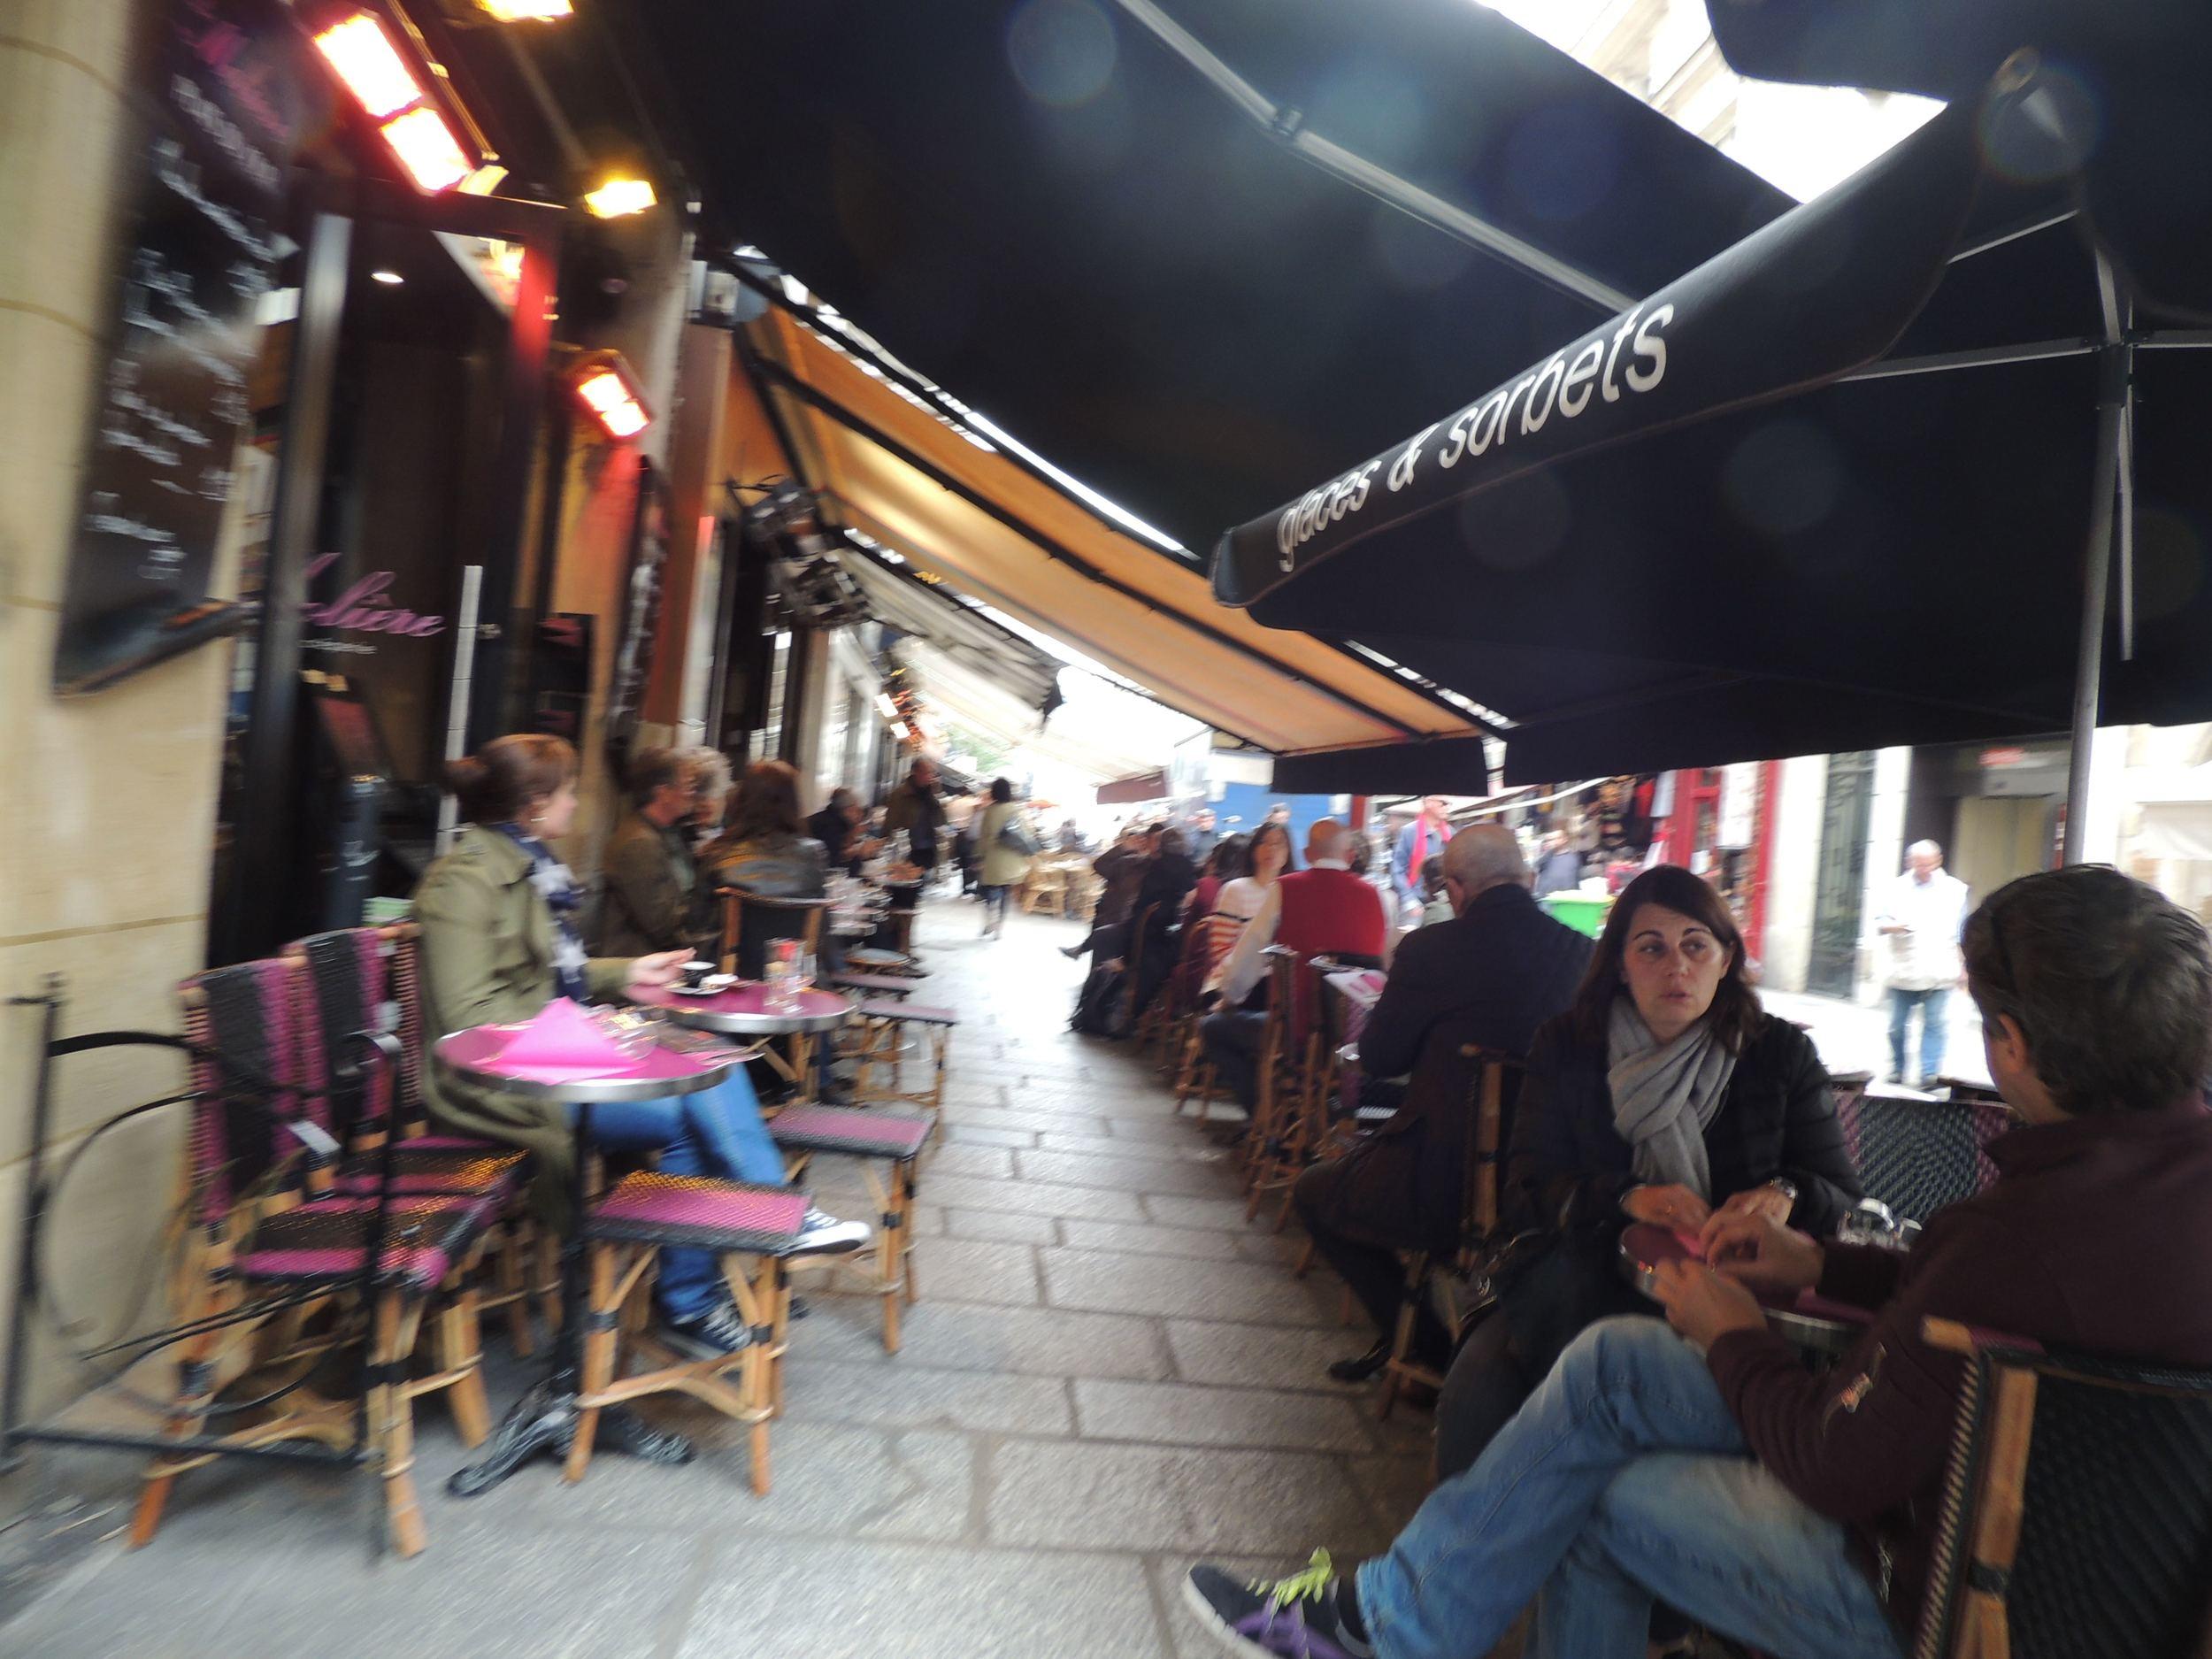 Ah Paris Sidewalk Dining in Europe   Robin Colton Interior Design Studio Austin Texas Blog   www.robincolton.com